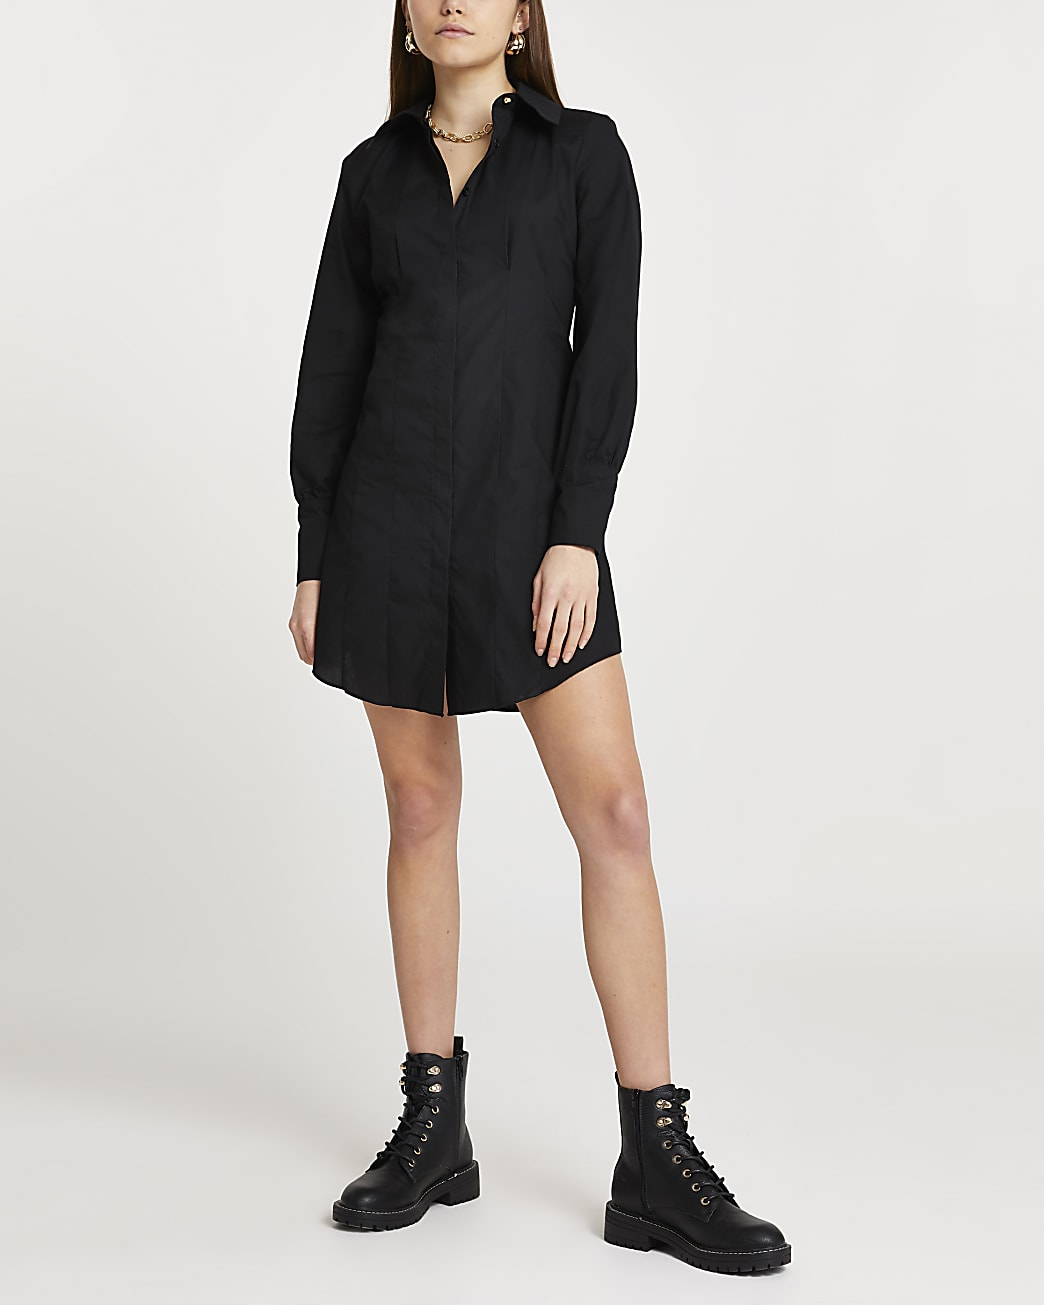 Black shoulder pad long sleeve shirt dress